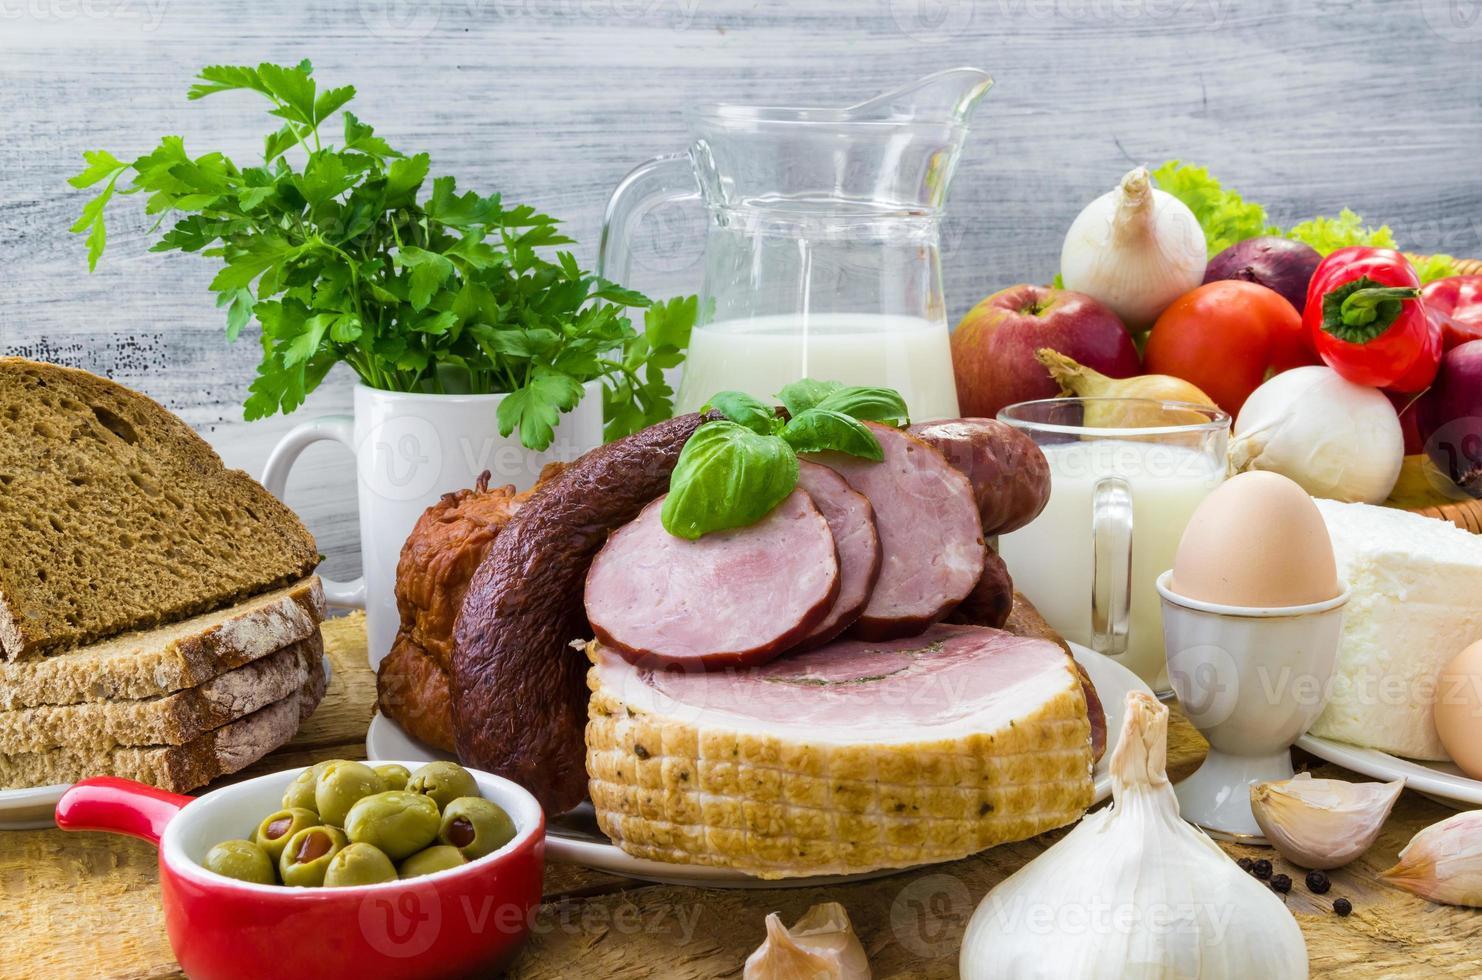 samenstelling variëteit kruidenierswaren vlees zuivel foto